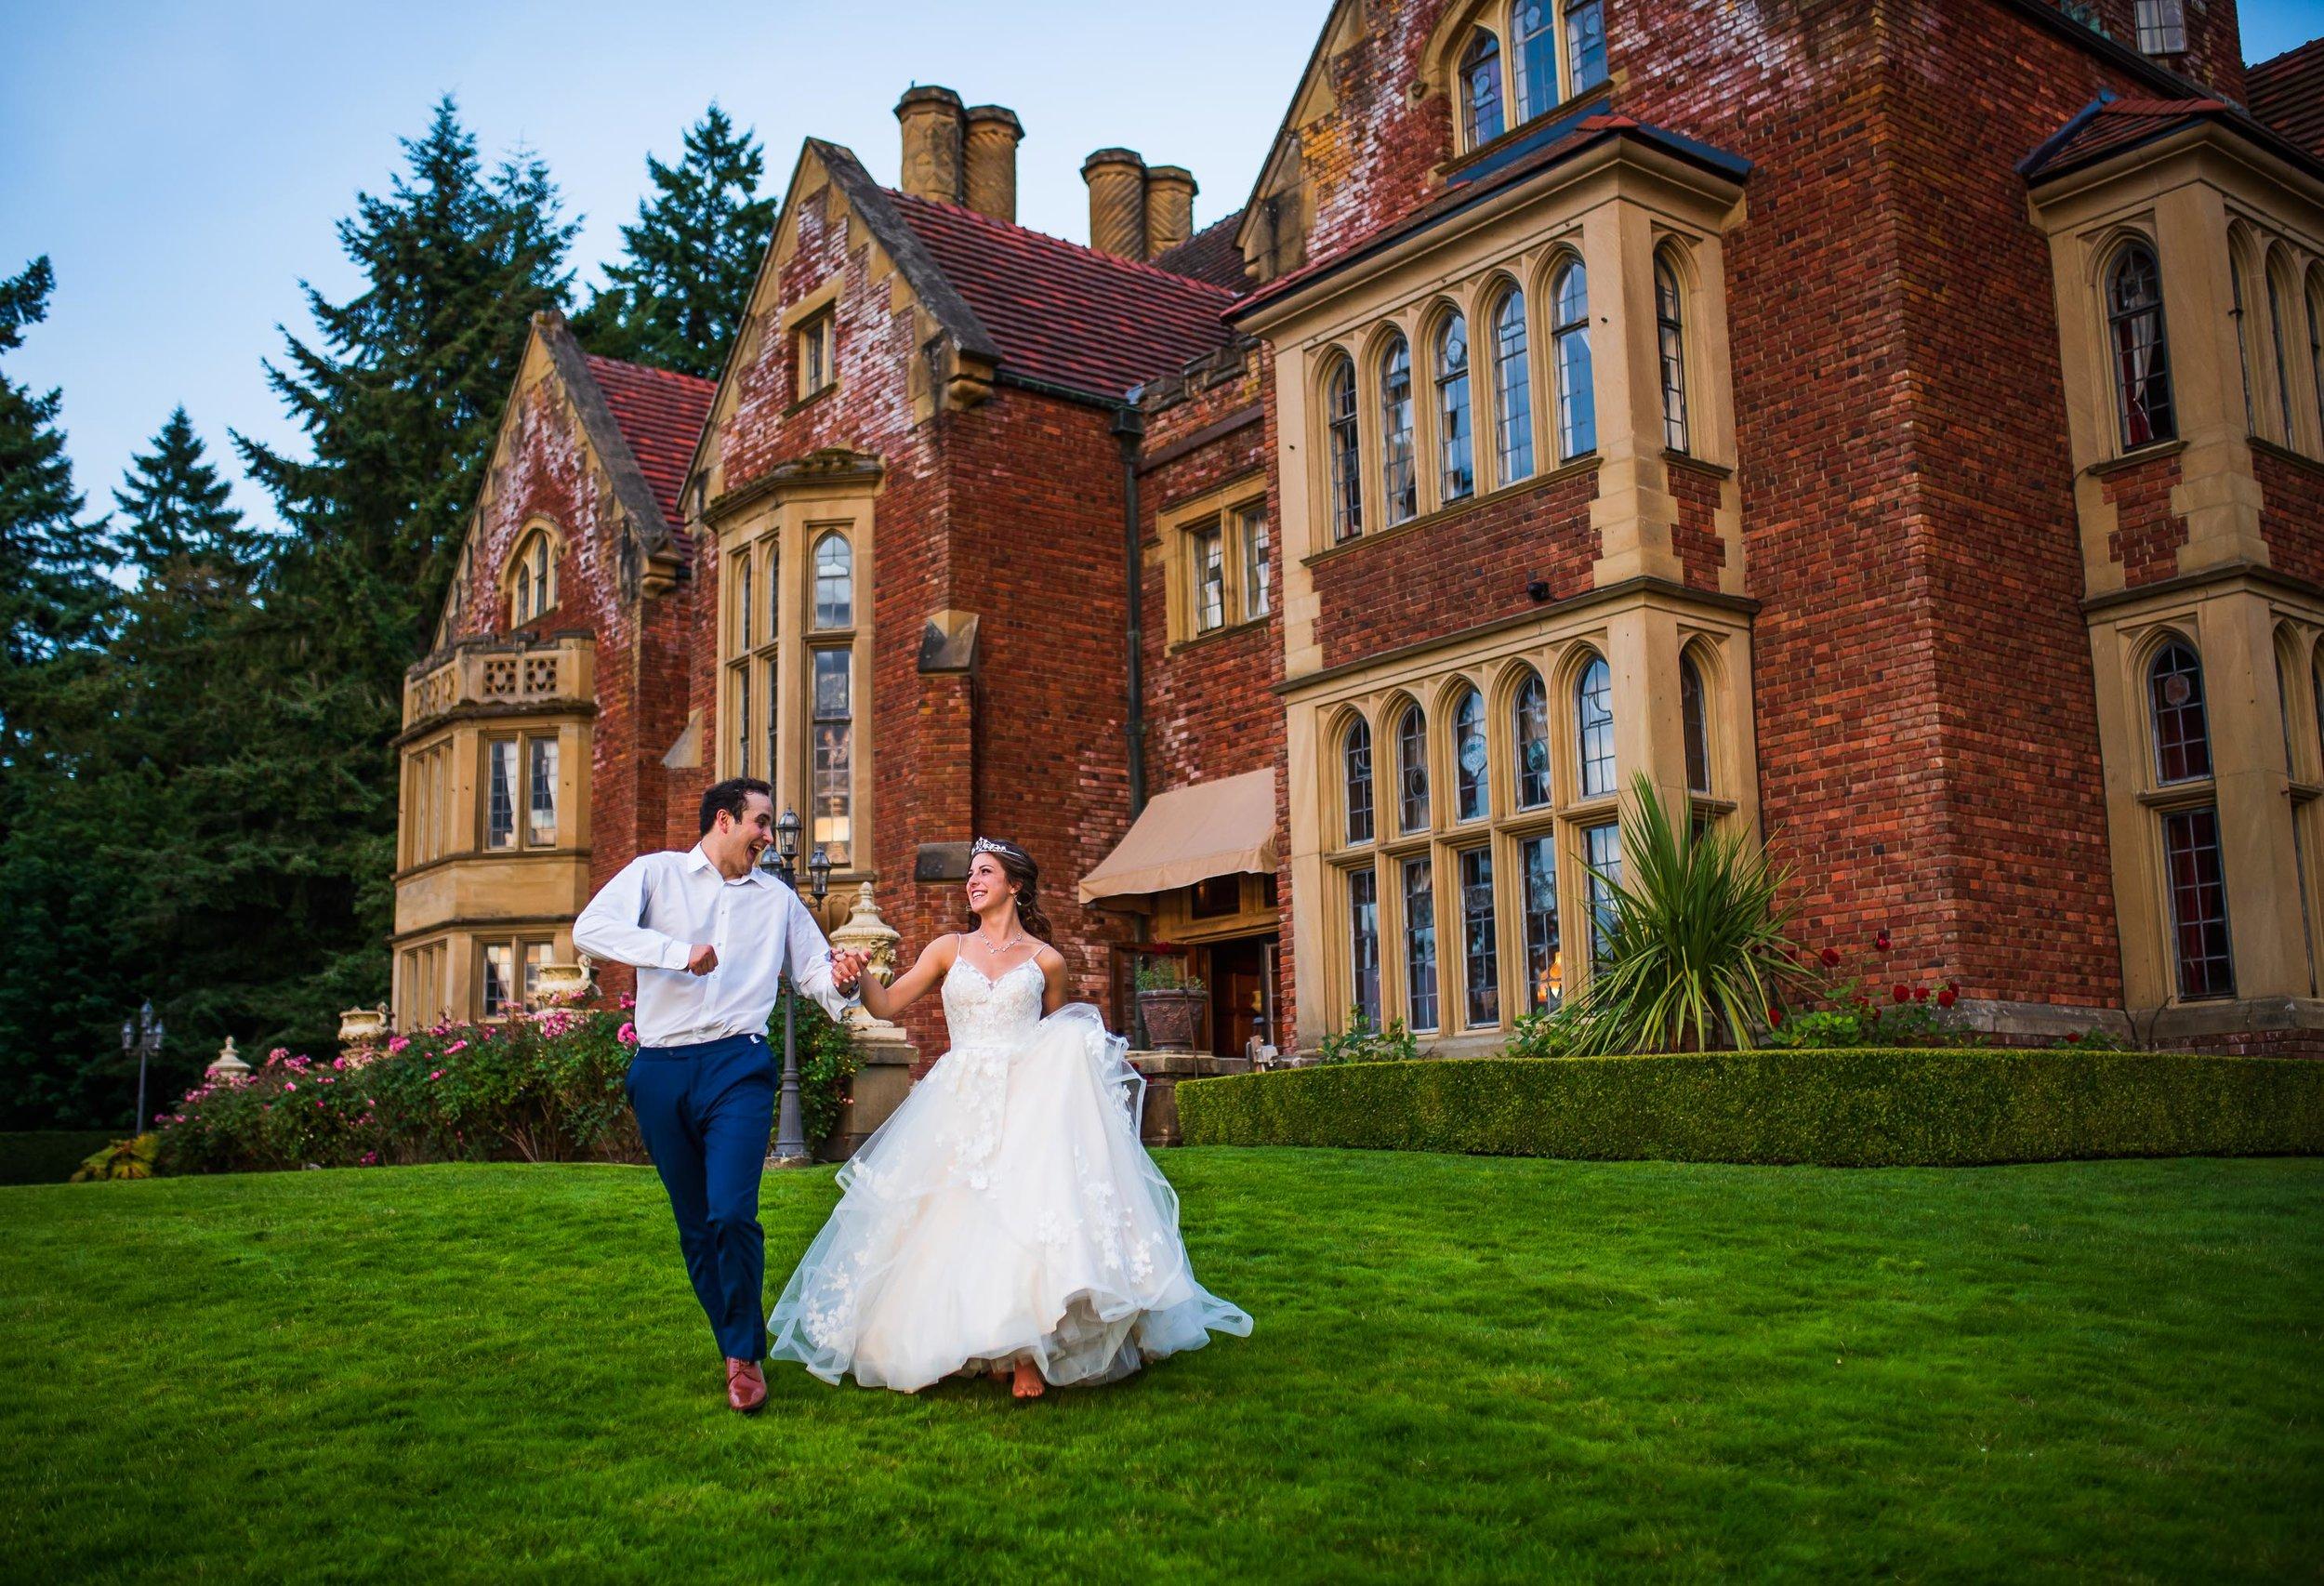 thornewood castle wedding 98.jpg